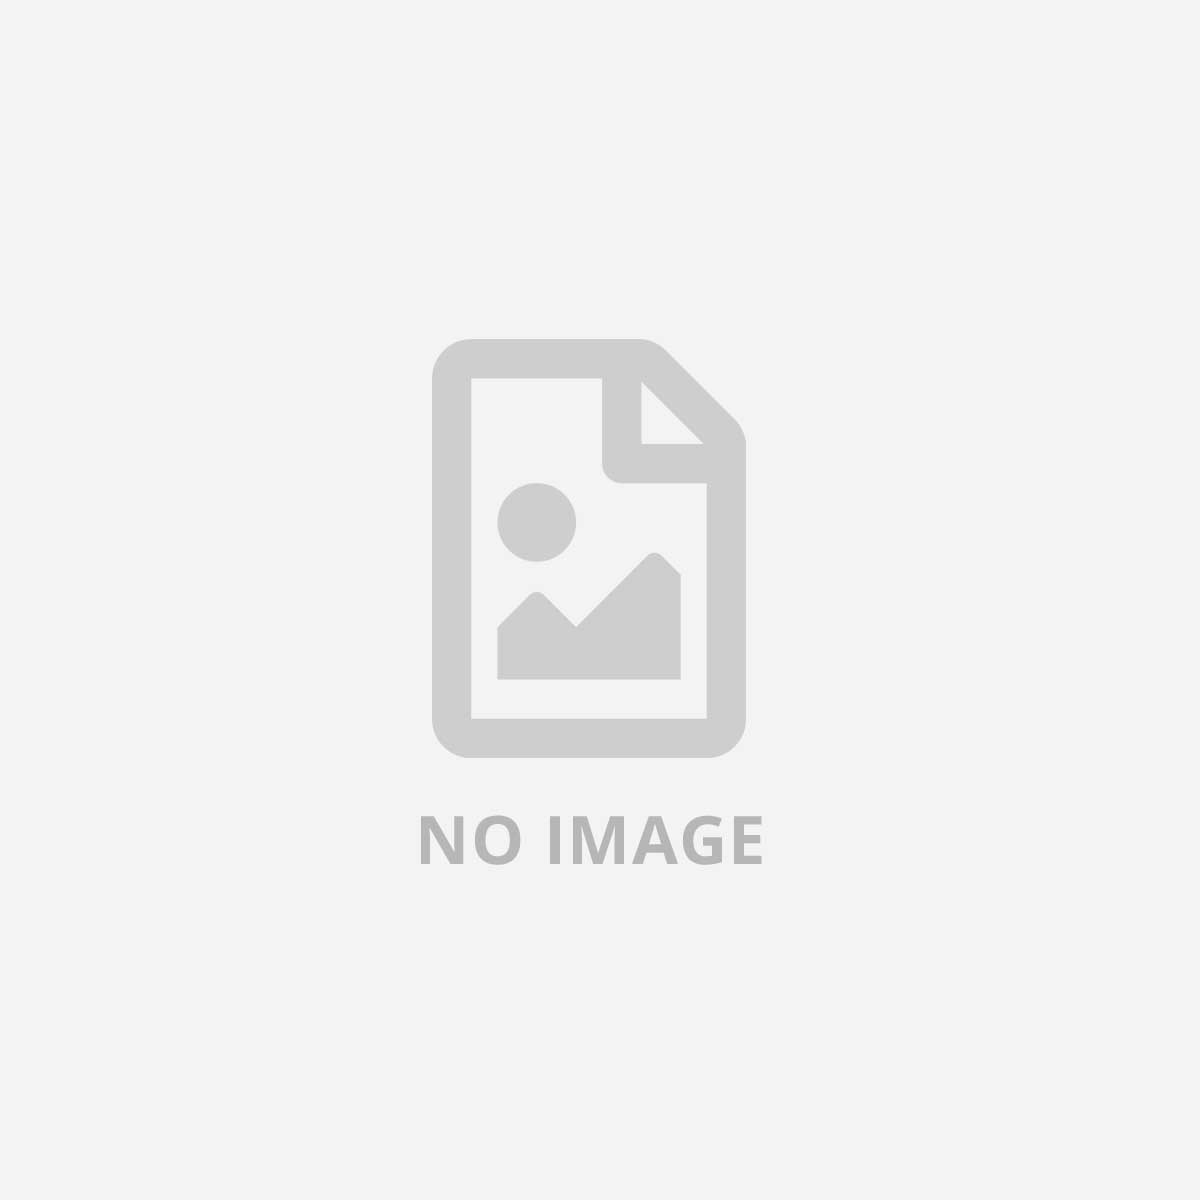 AMD ATHLON X4 3500MHZ 4 CORE